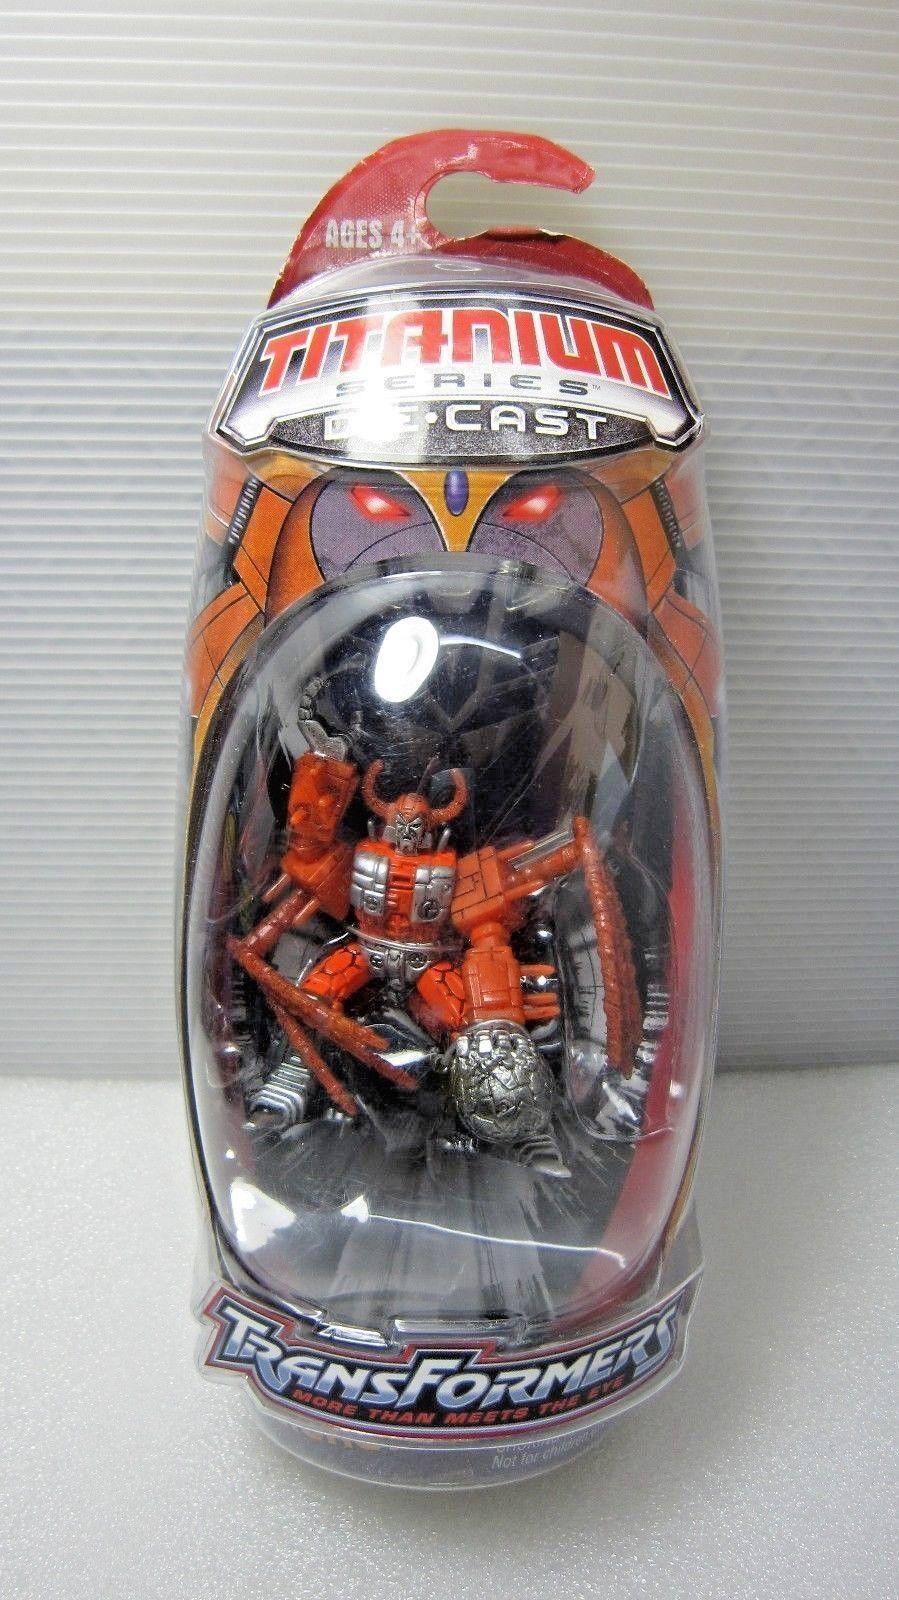 Transformers Titanium Die-cast Unicron New MIB ROBOTS NOVELTY GIFT RARE COLLECT